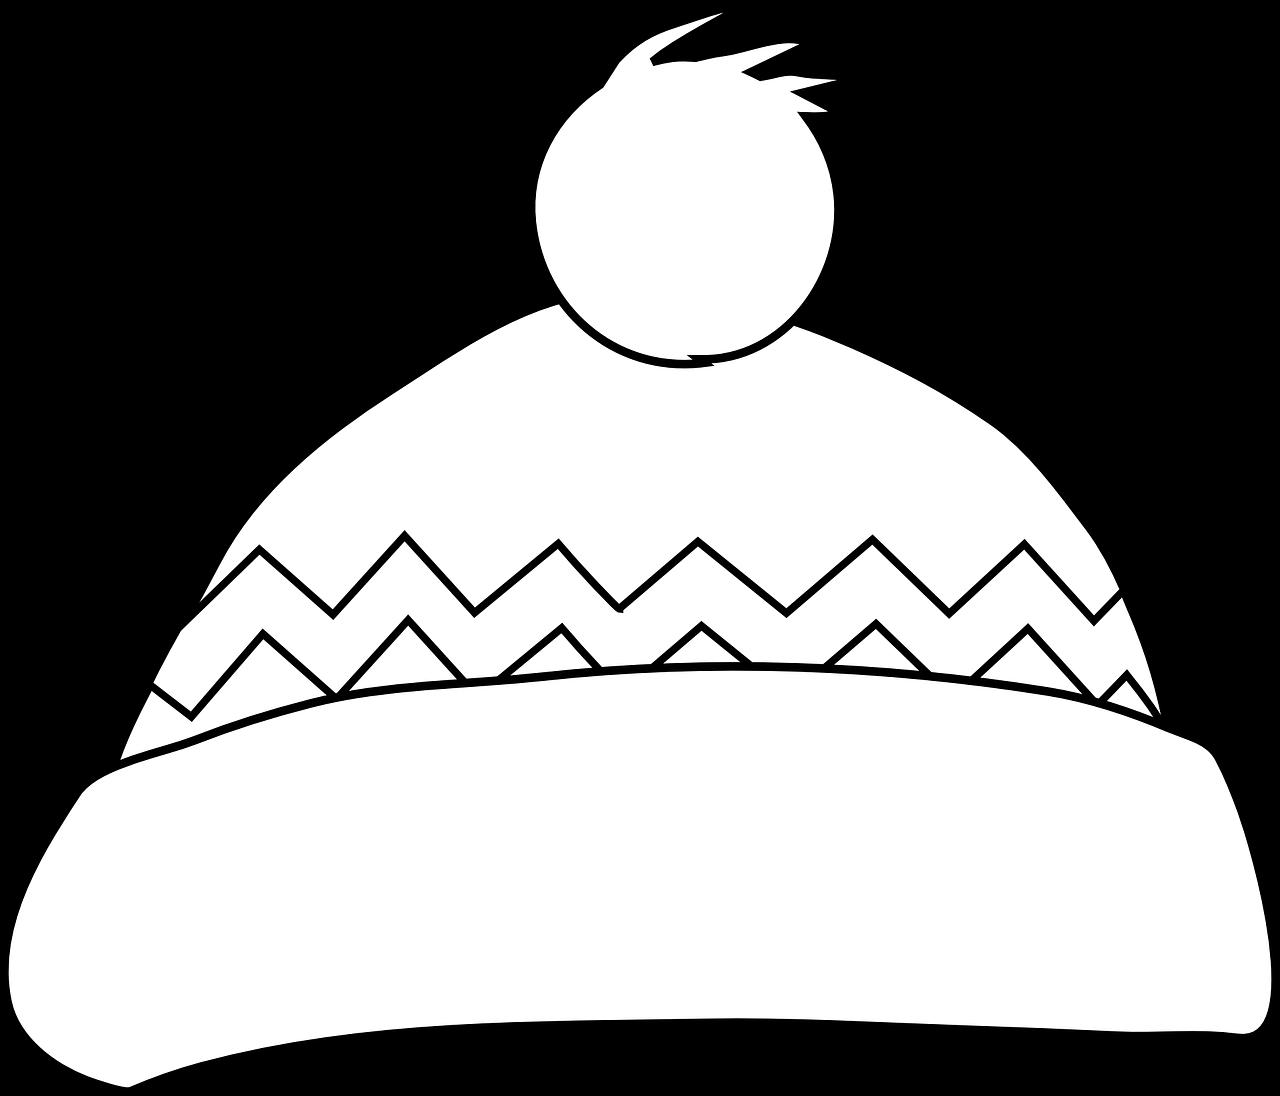 bobble-cap-308348_1280